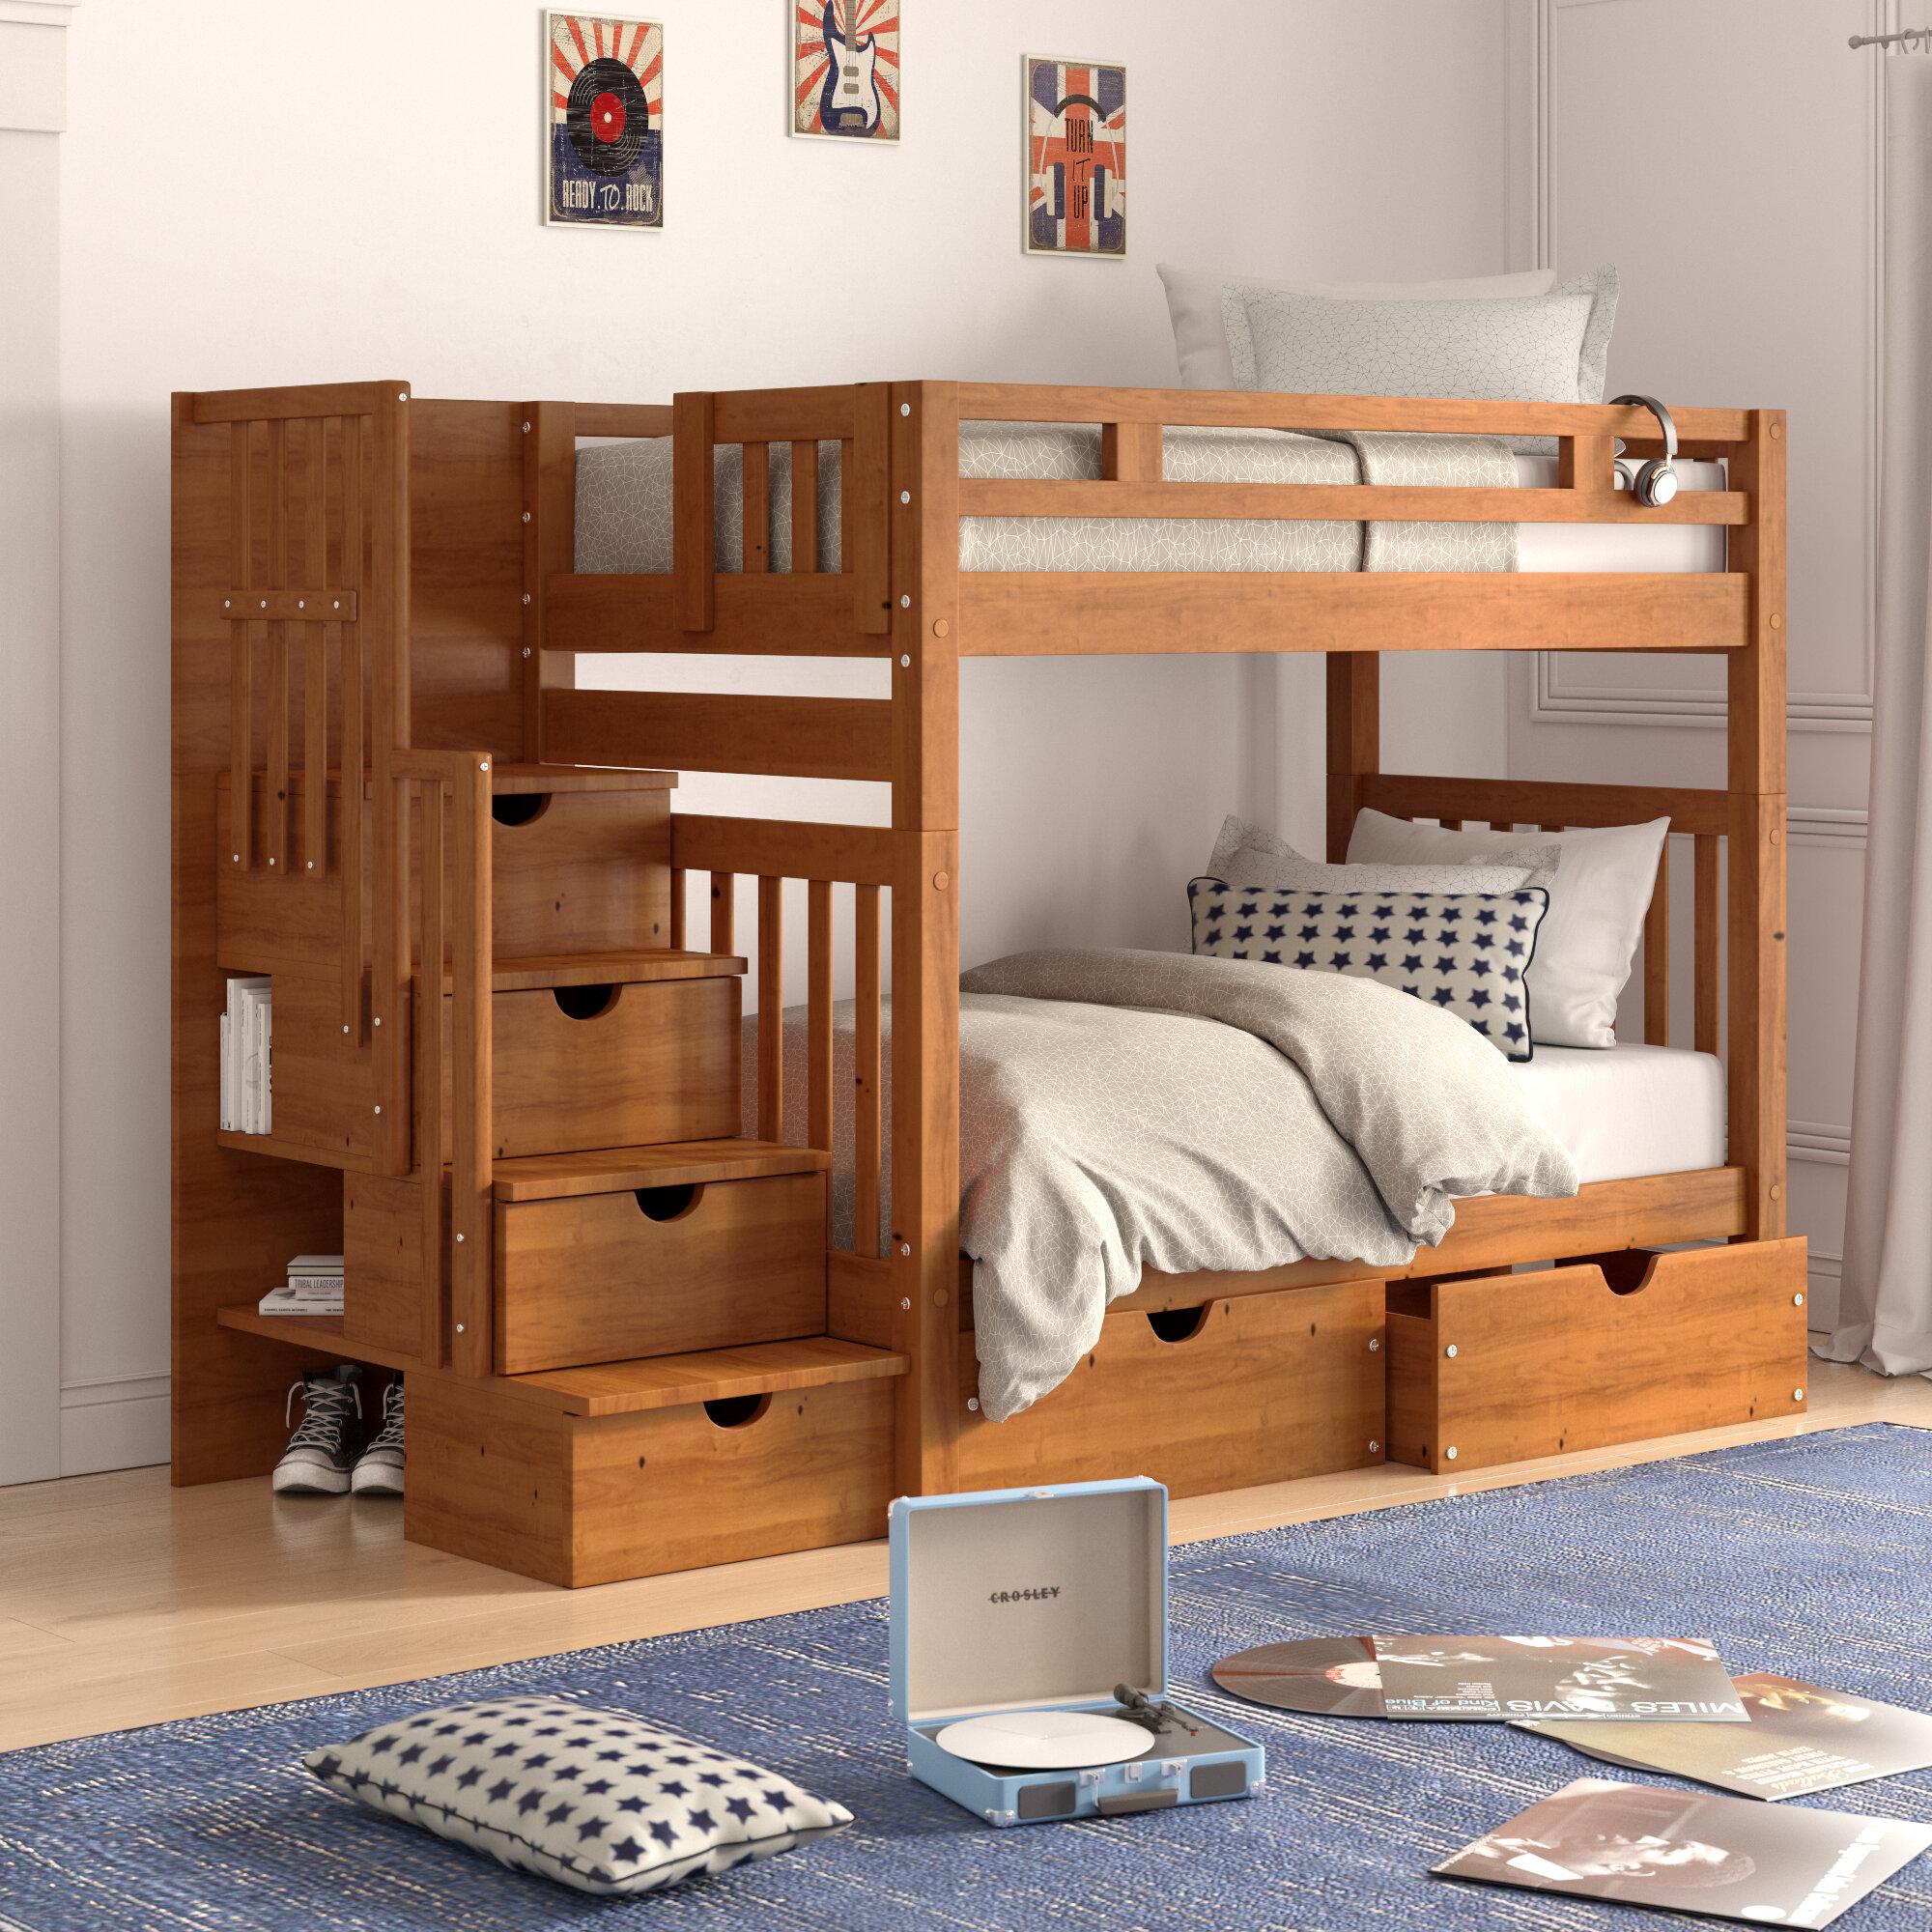 Harriet Bee Langley Futon Bunk Bed With